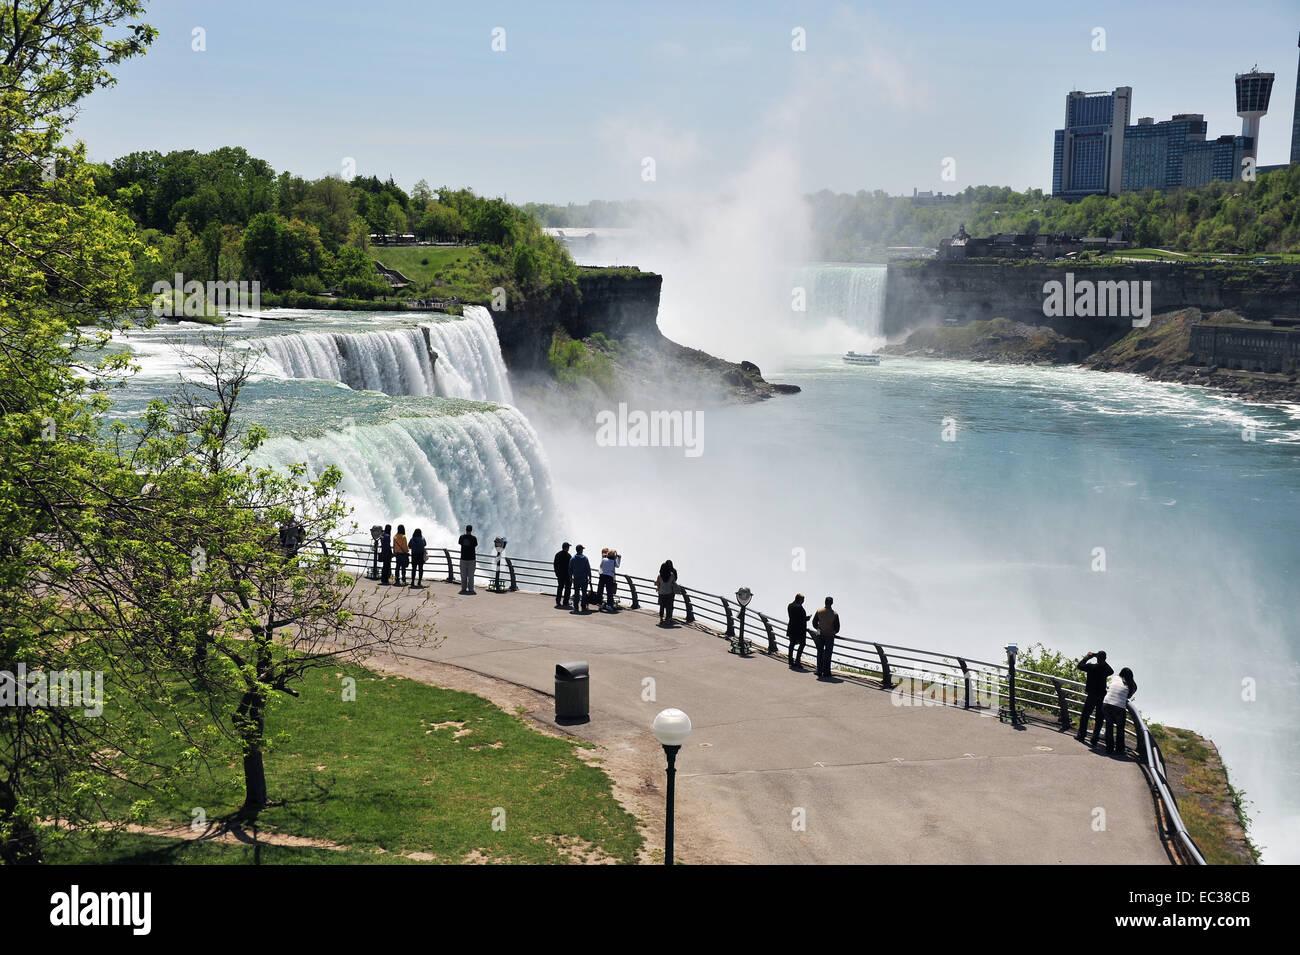 Niagara Falls Niagara Falls On The Border Between The Us